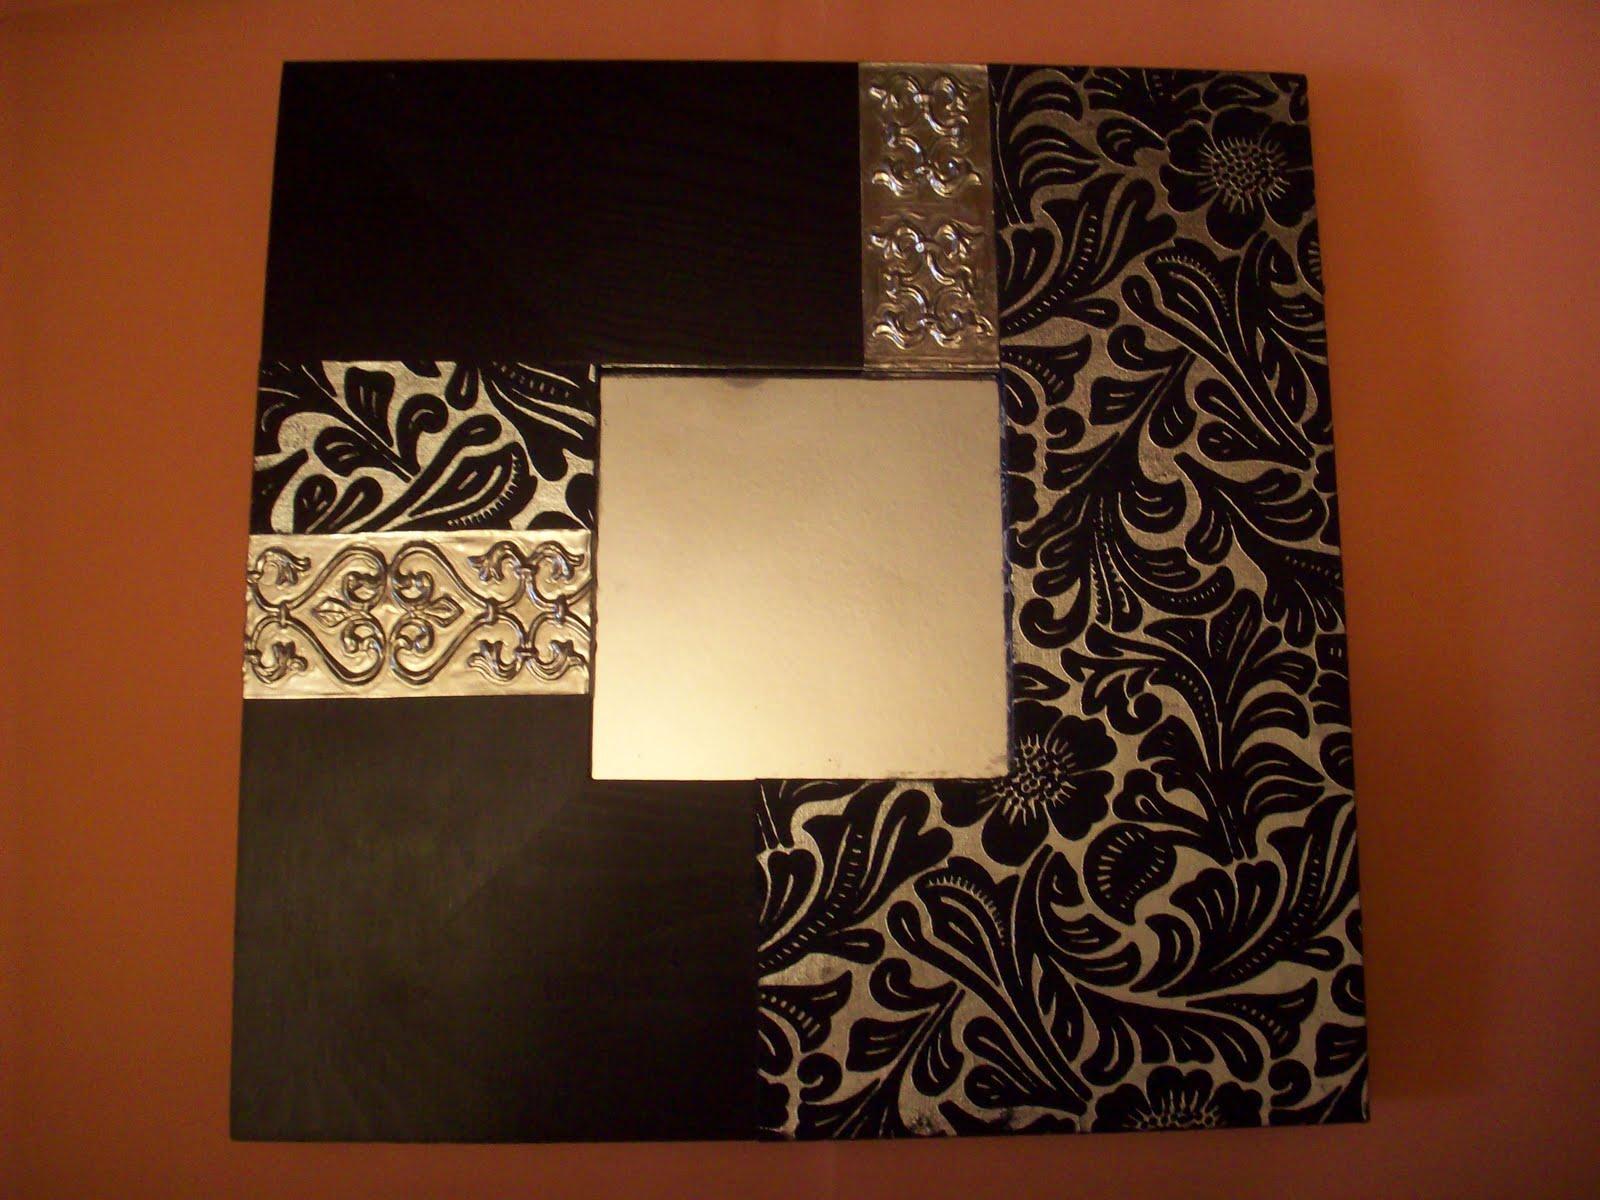 Creando manualidades cuadros malma decorados - Manualidades espejos decorados ...